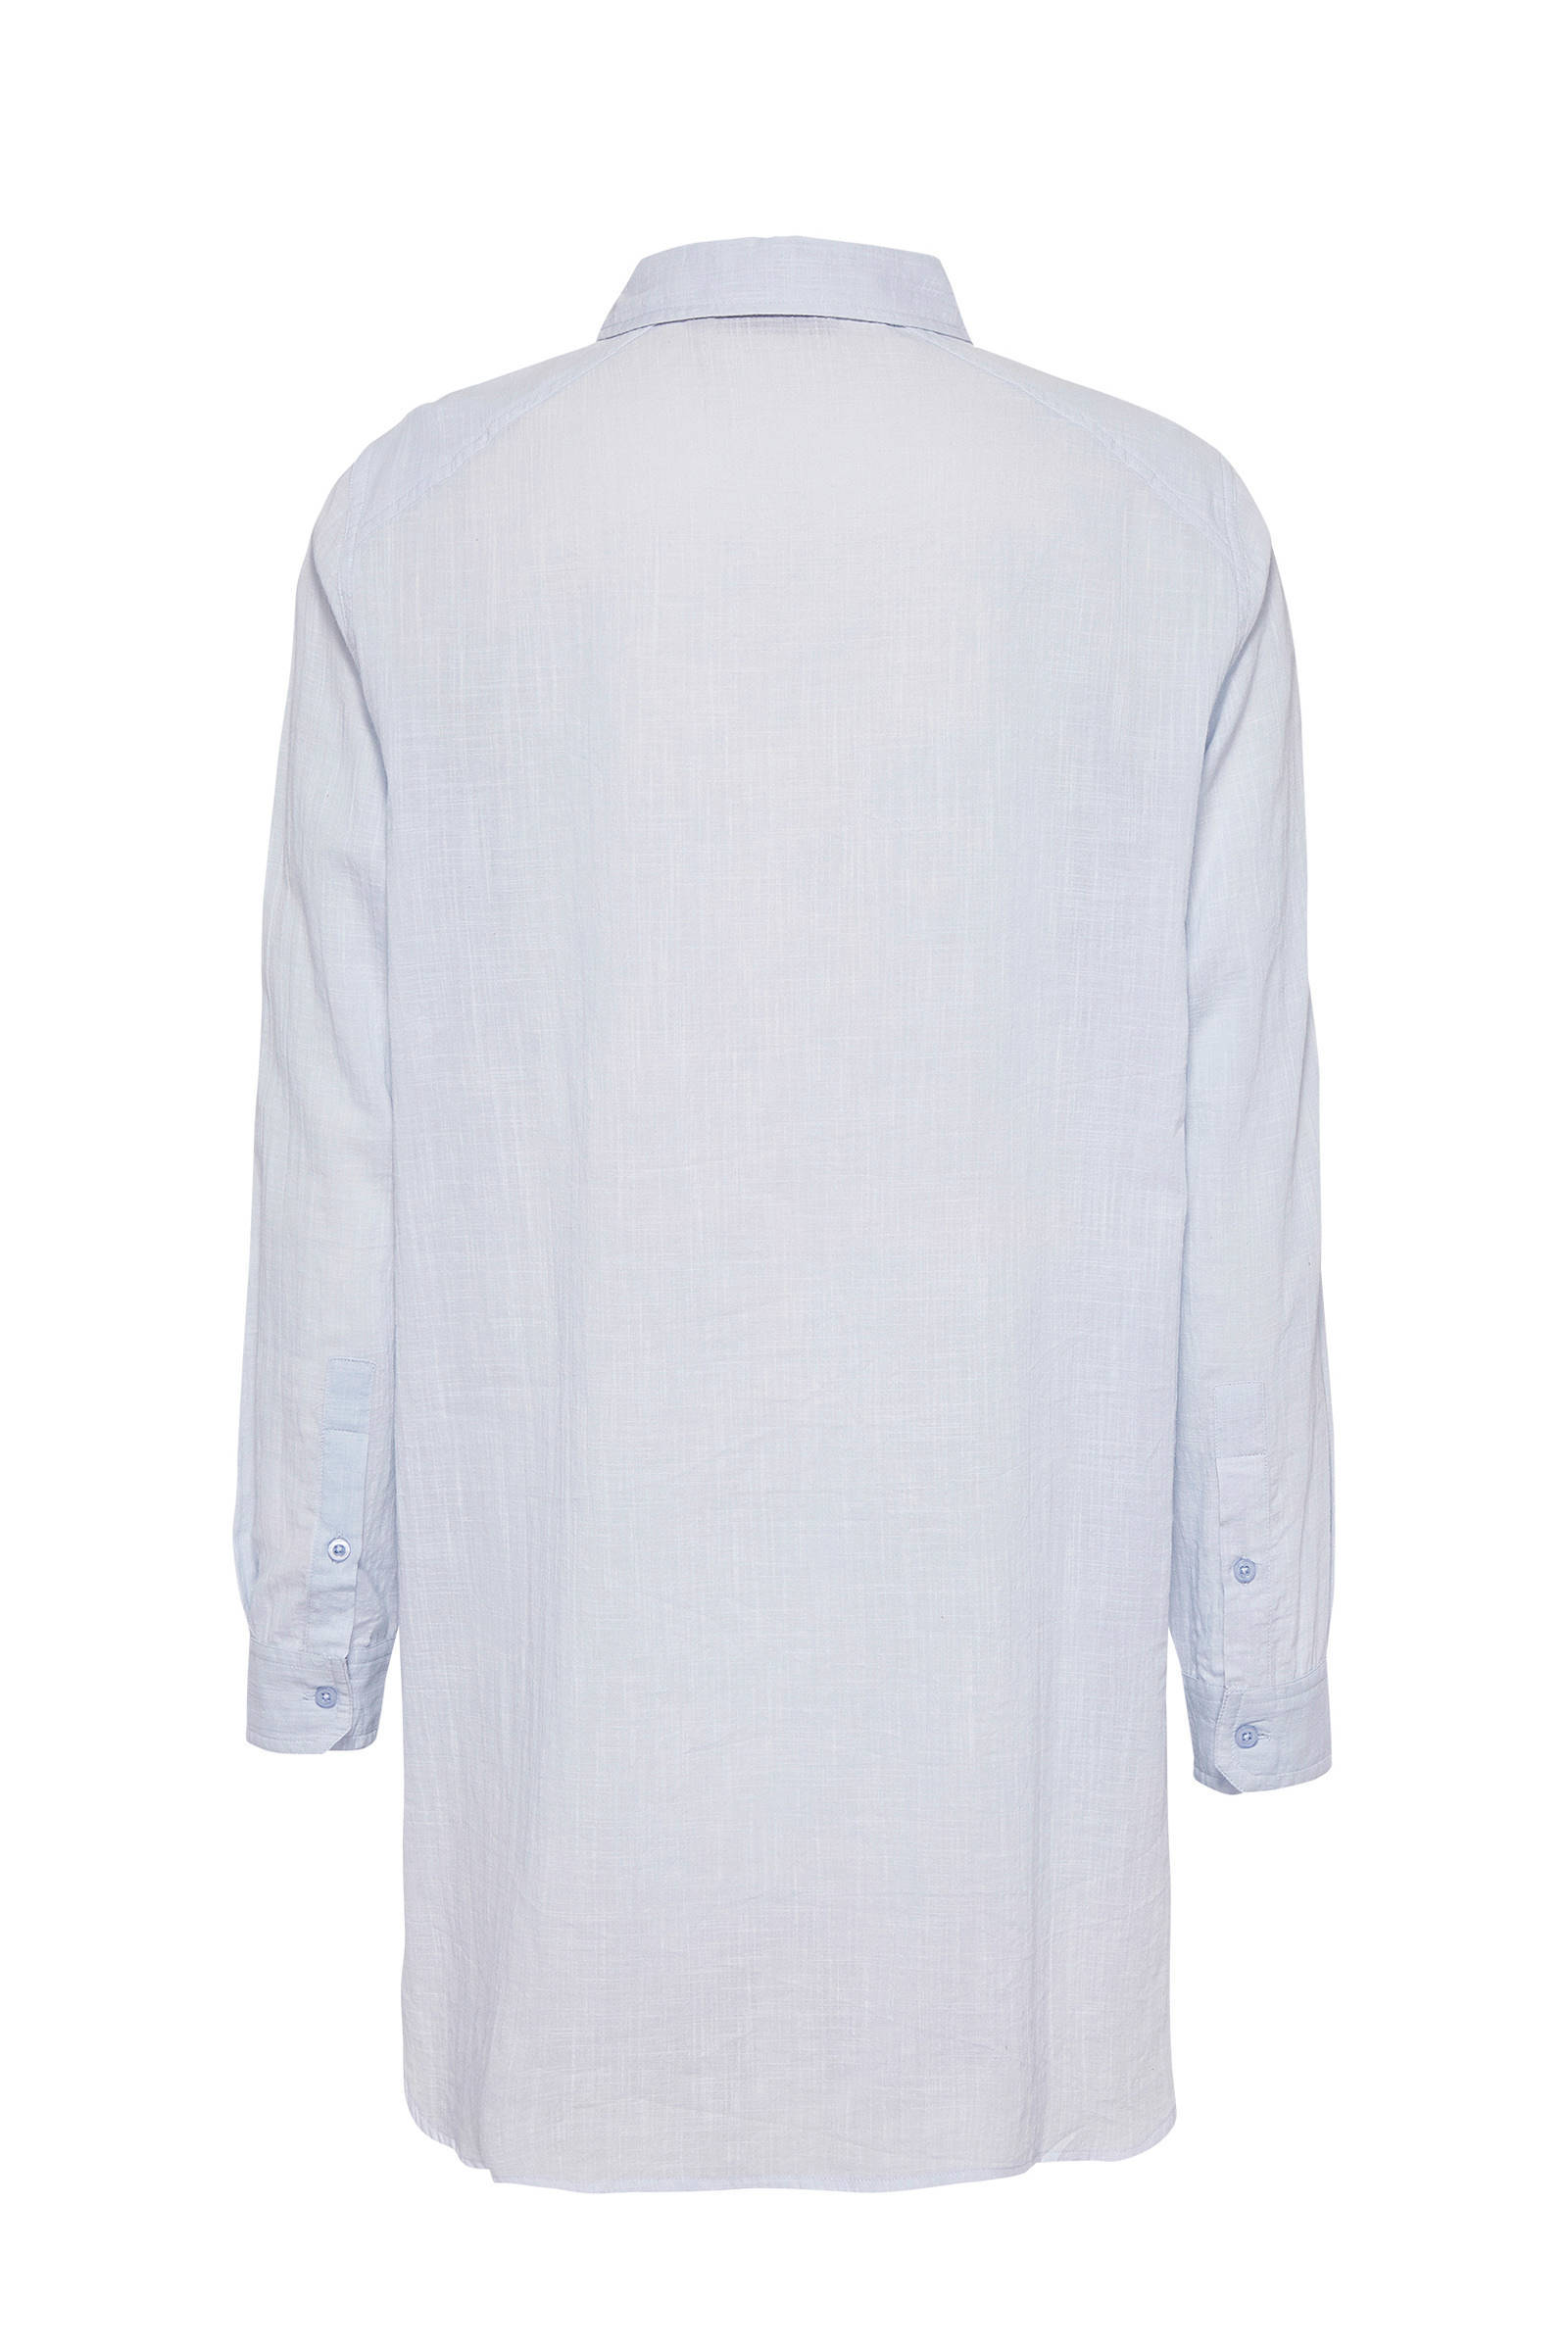 Didi borstzakje blouse blouse blouse met borstzakje Didi met met Didi Didi borstzakje met blouse AwqqTnvIxX